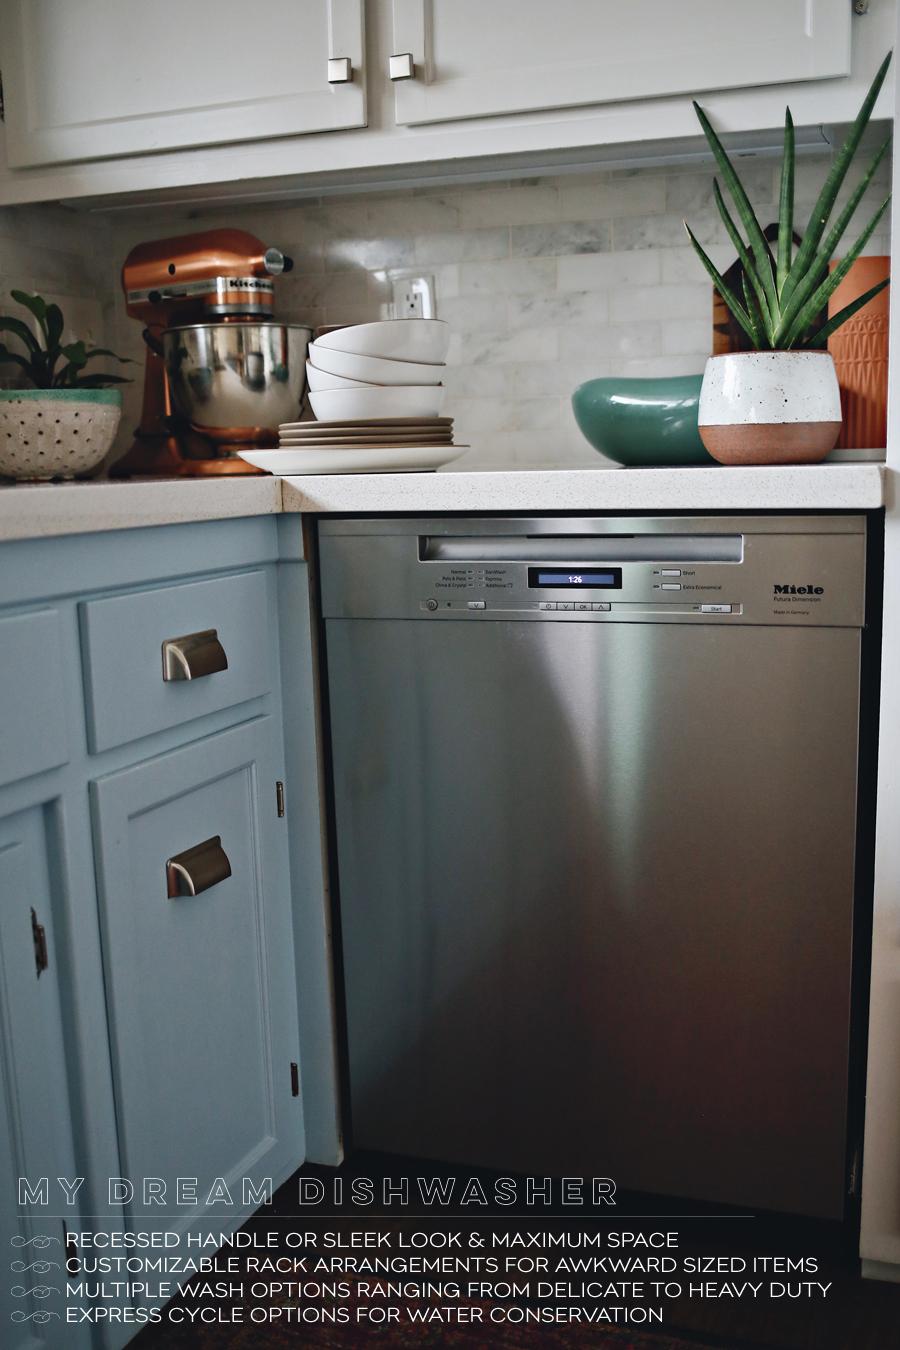 dine-x-design-dishwasher-review-miele-futura